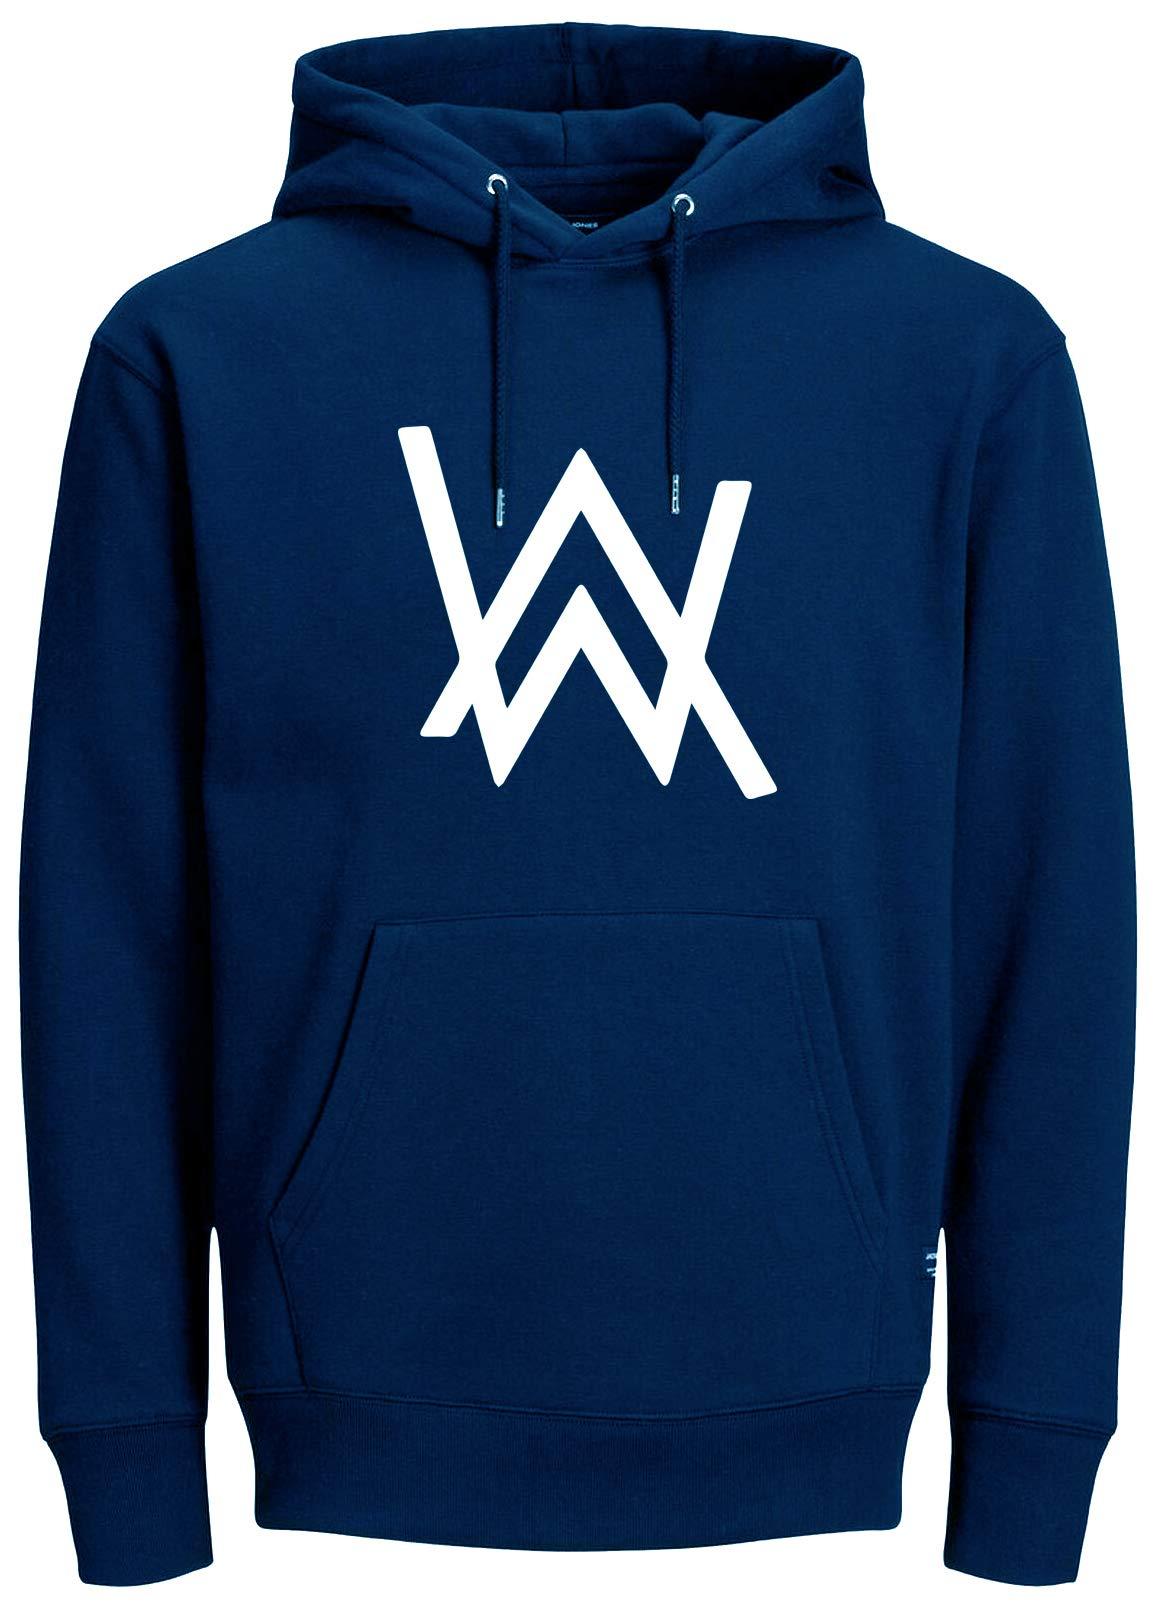 ABSOLUTE DEFENSE Alan Walker Hoodie for Men Women Casual Sweatshirt Regular fit Winter Jacket Boy Girl Hoodie Blue (B07XX5DX35) Amazon Price History, Amazon Price Tracker